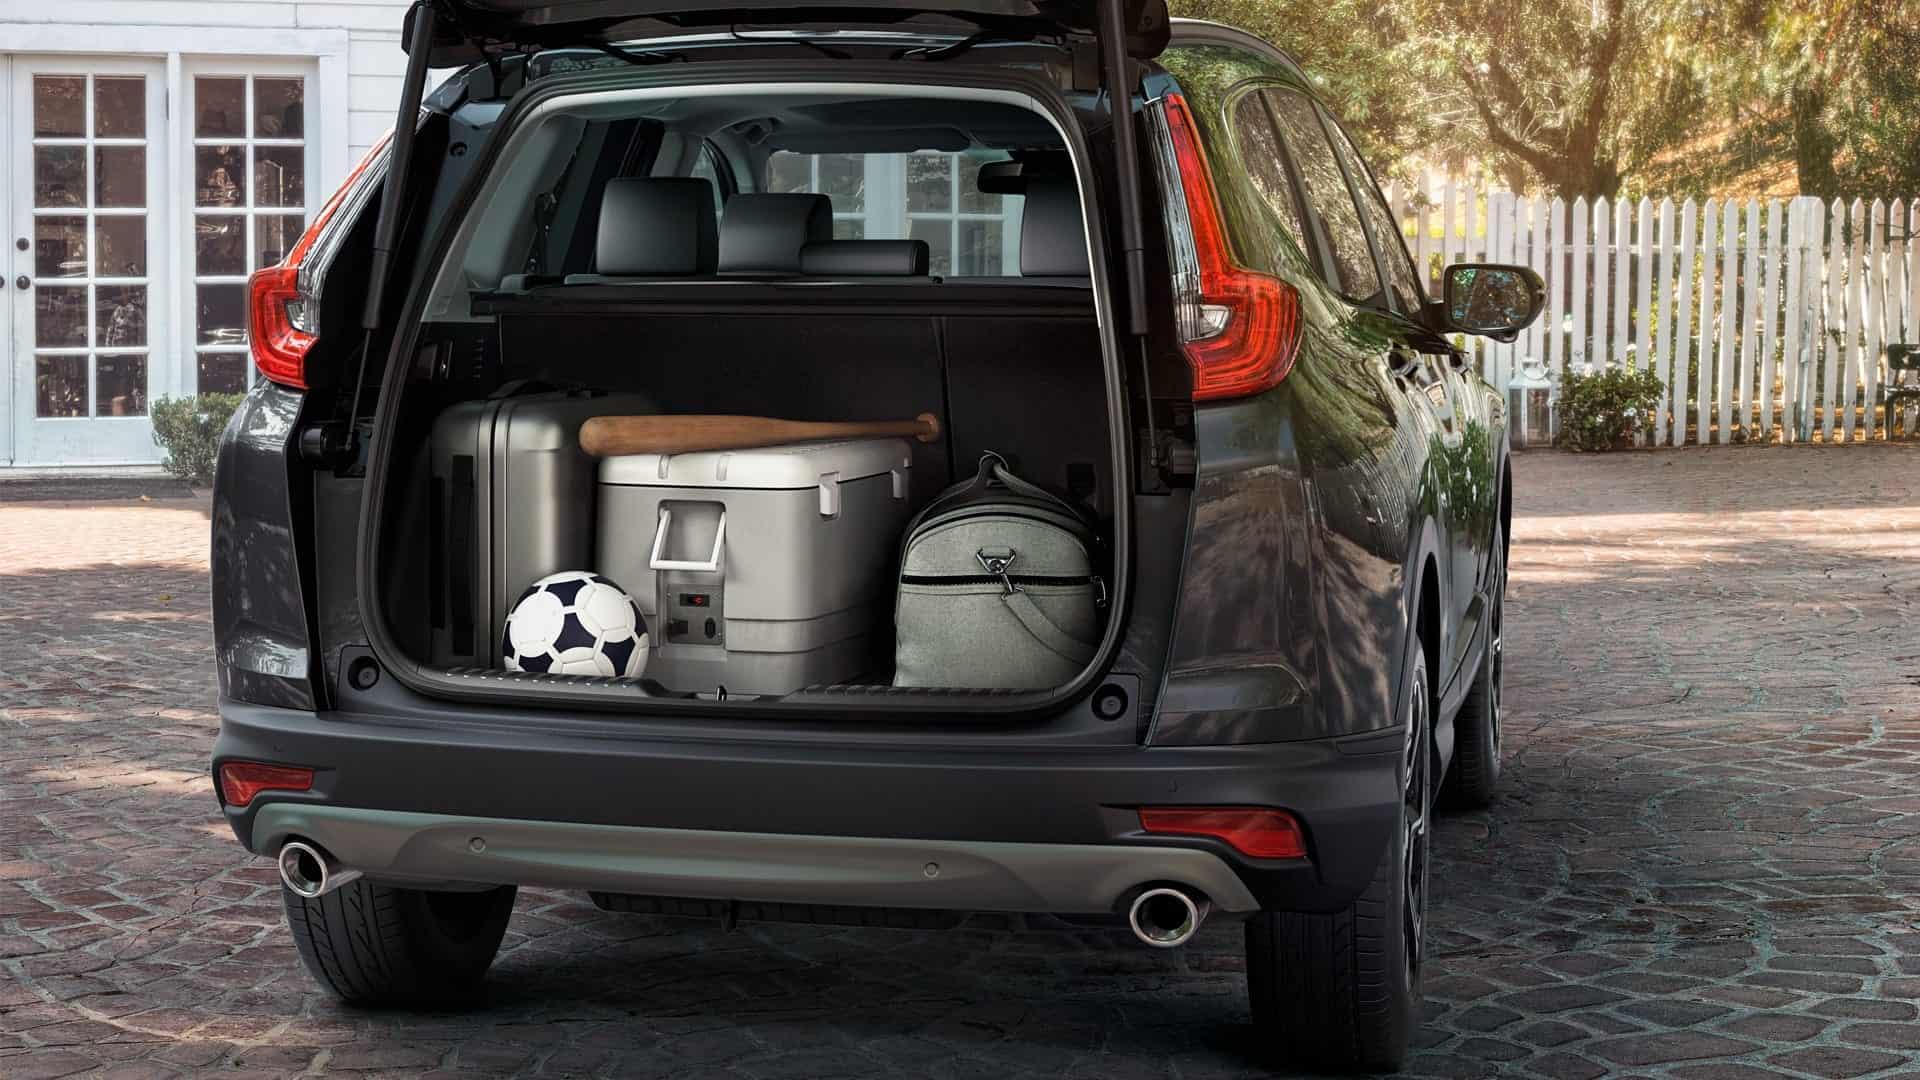 CR-V - Amplo porta-malas de 522 litros*